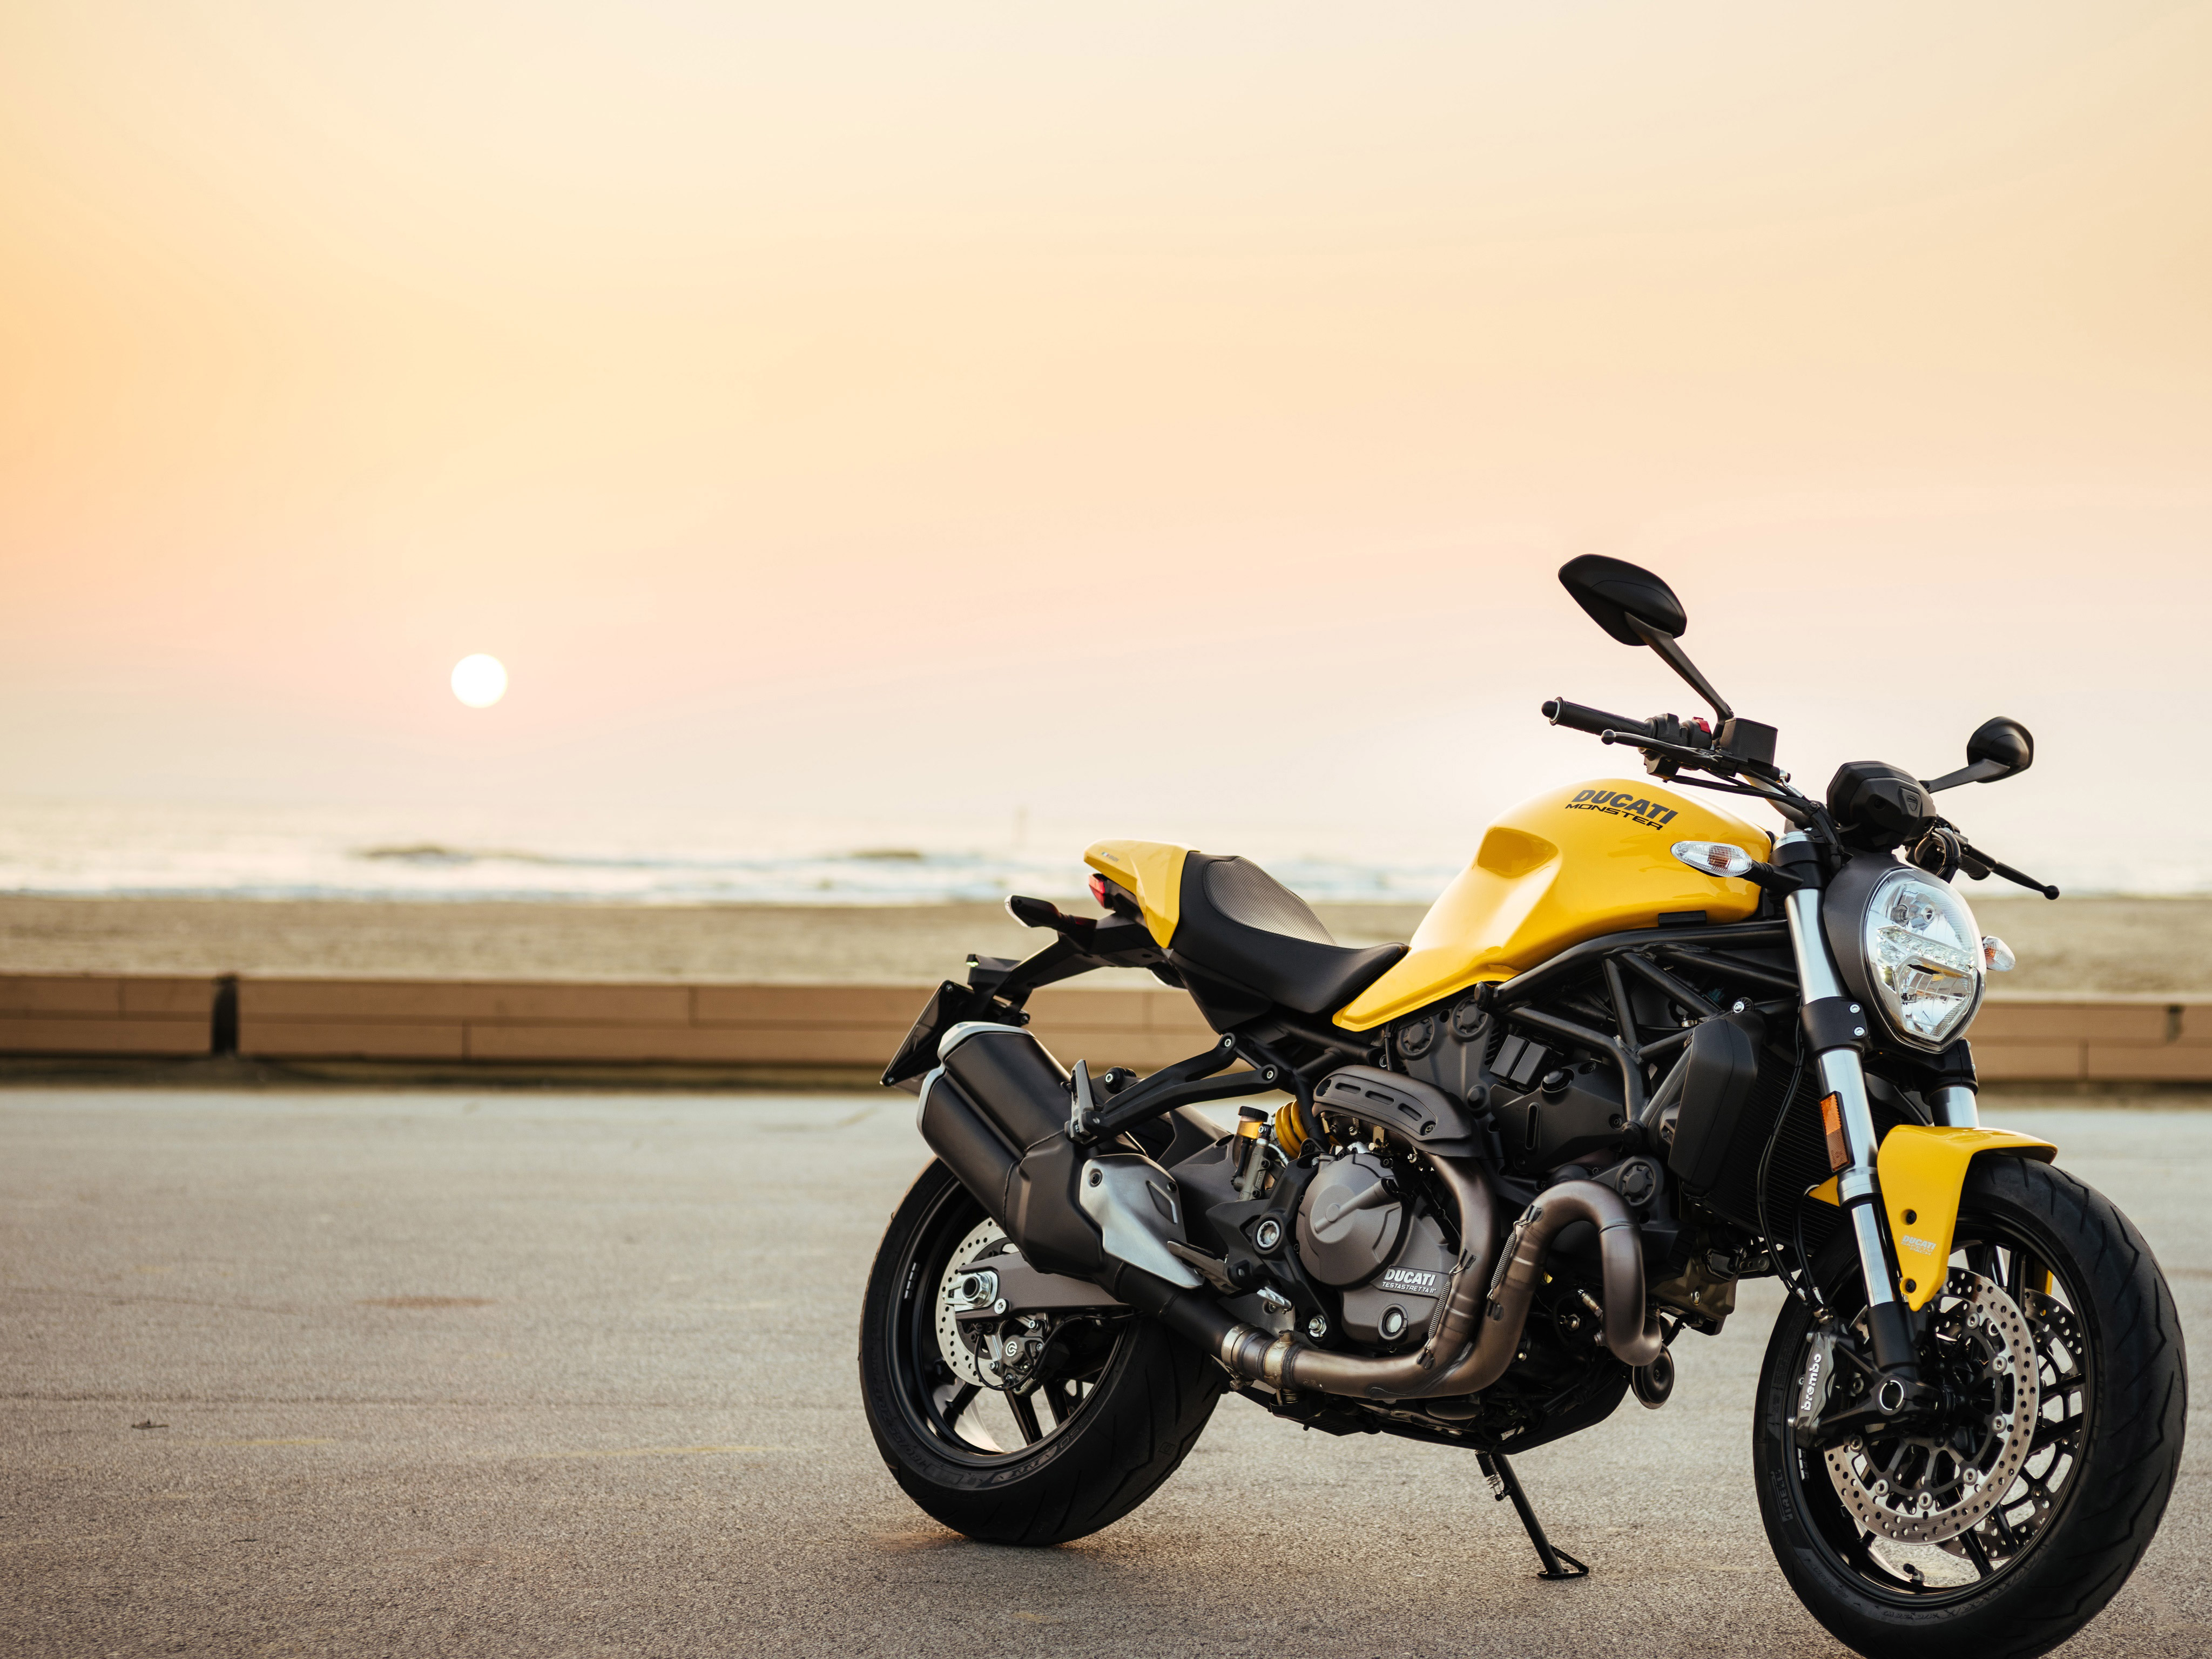 Ducati Monster 821 2017 4k, HD Bikes, 4k Wallpapers